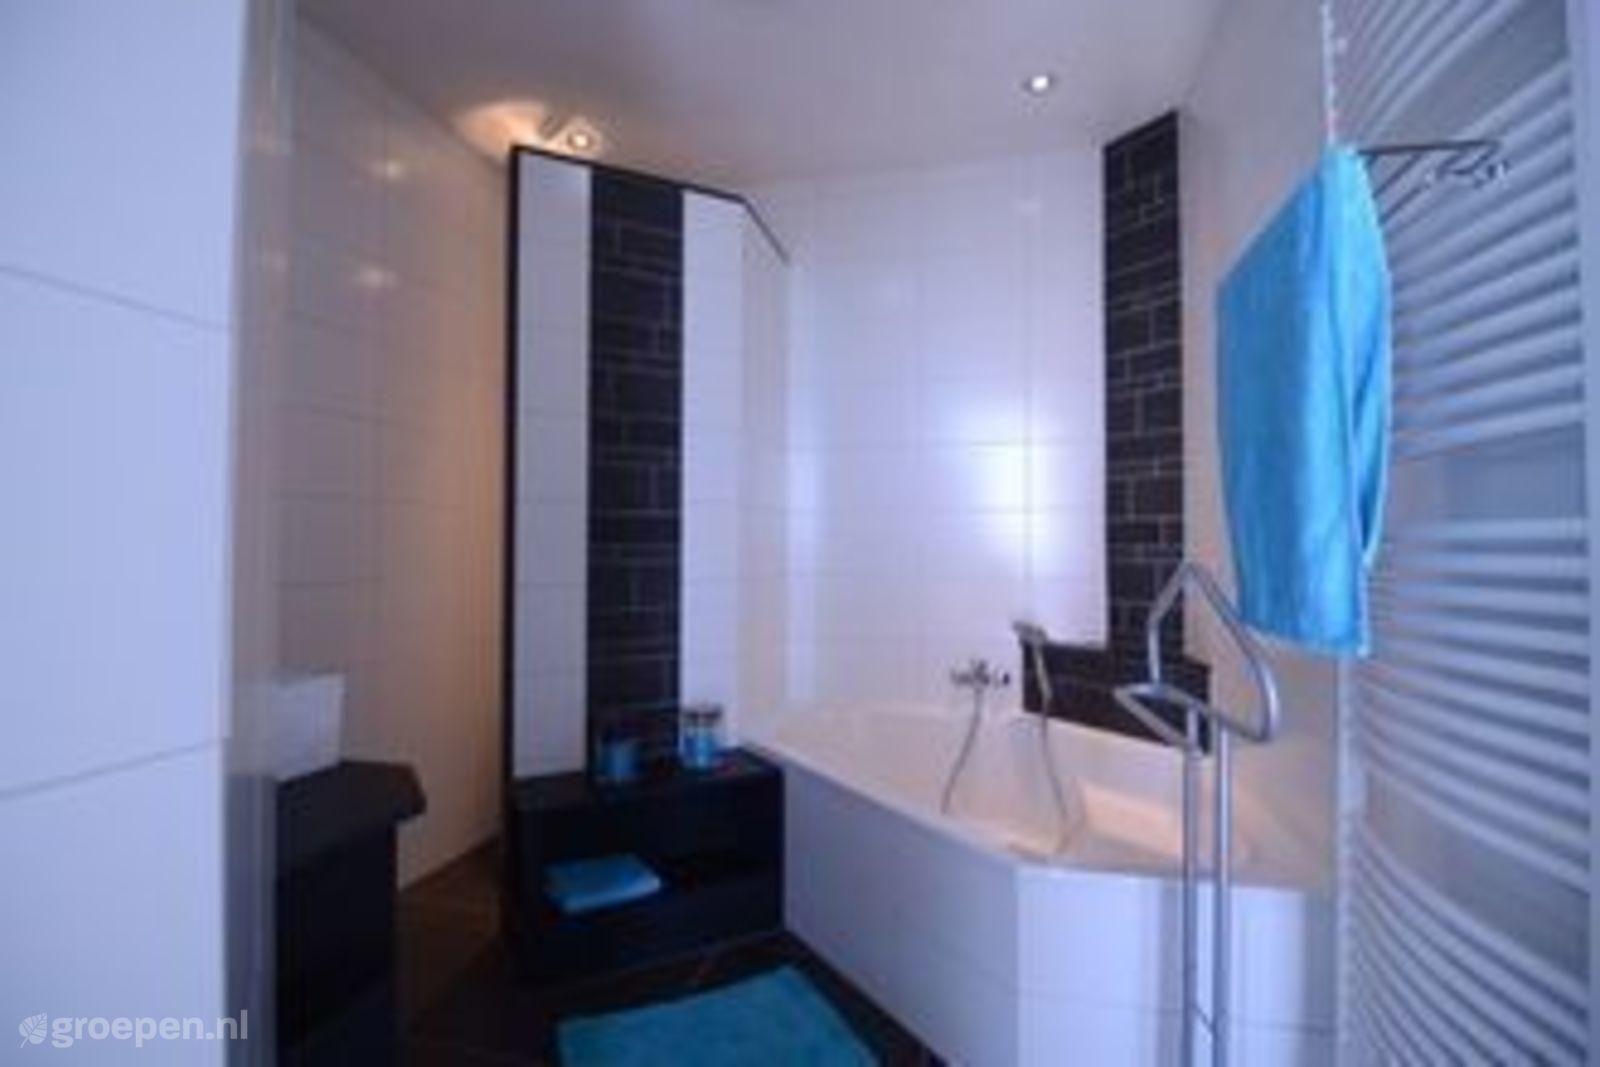 Group accommodation Venhorst